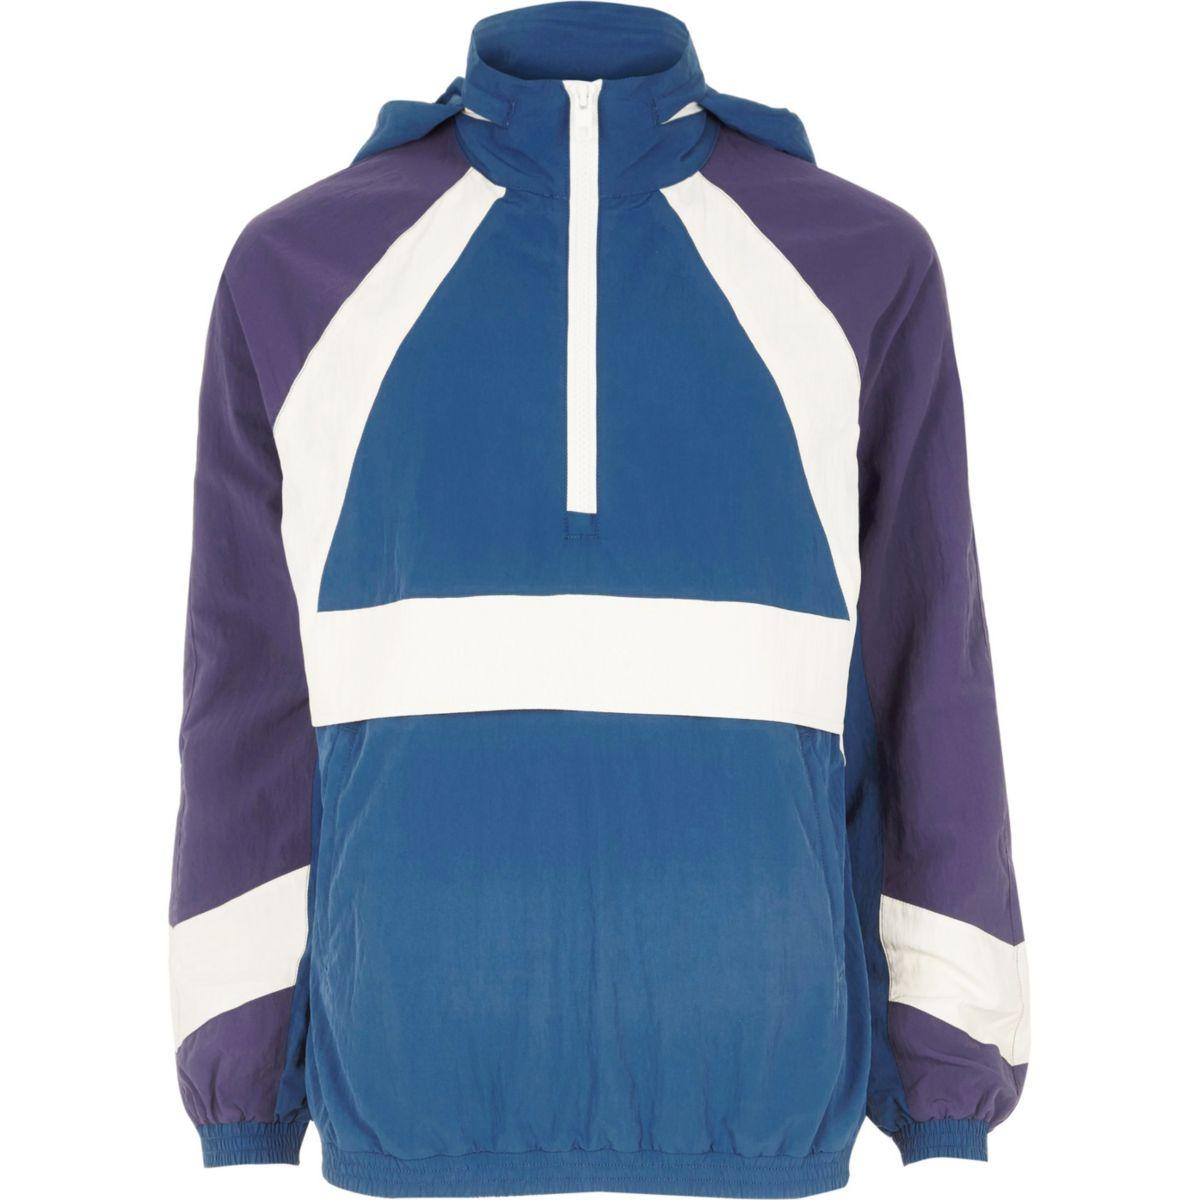 Blue panel sports jacket